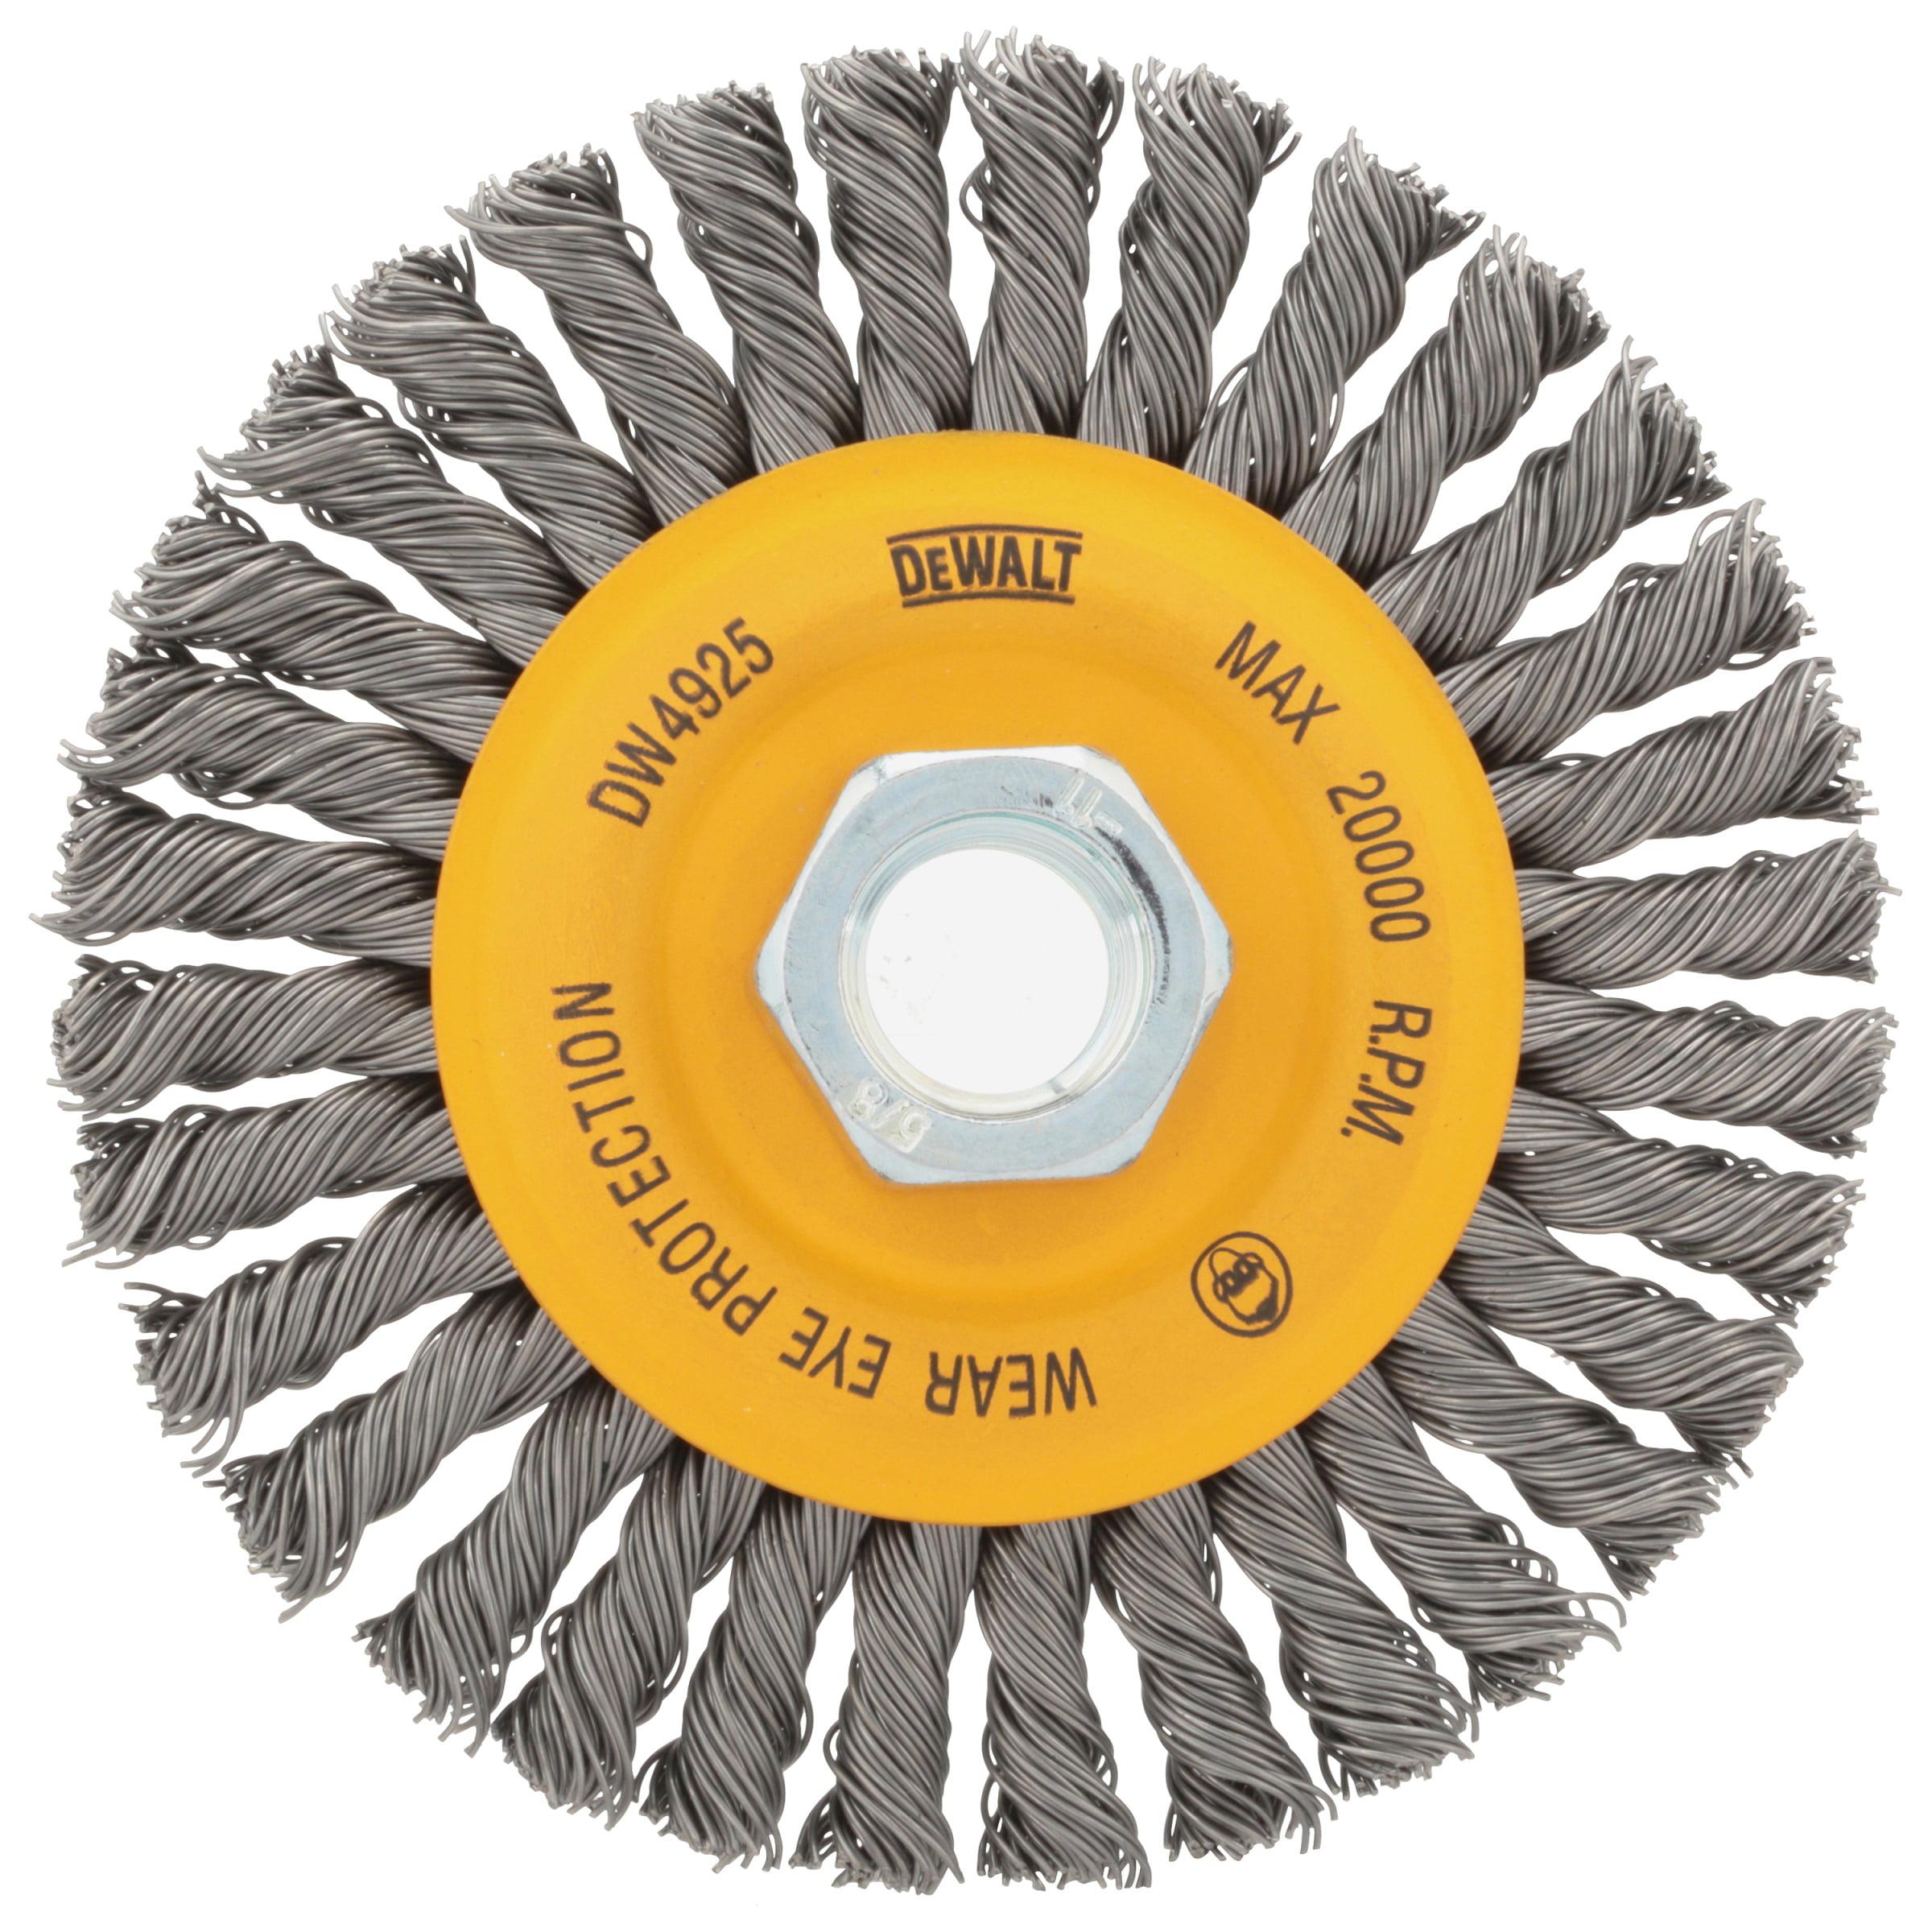 Knotted  Wire Wheel Brush  Carbon Steel  20000 rpm 1 pc. DeWalt  1 in